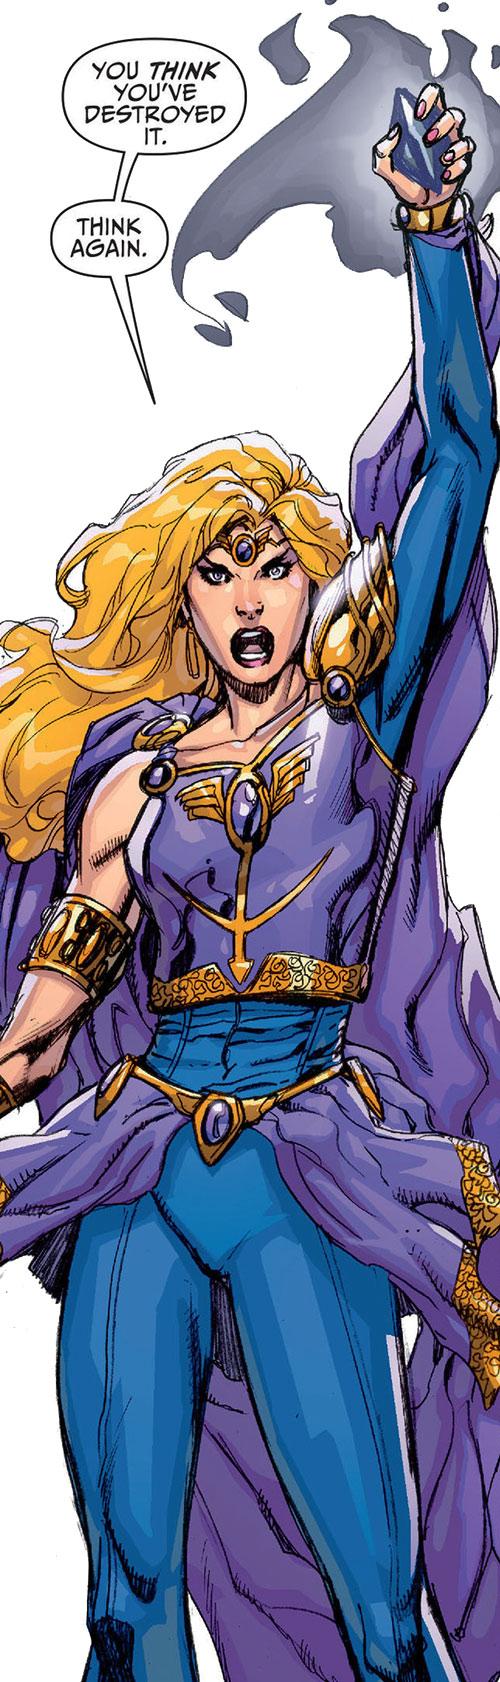 Amethyst (DC Comics New52) brandishing the Black Diamond